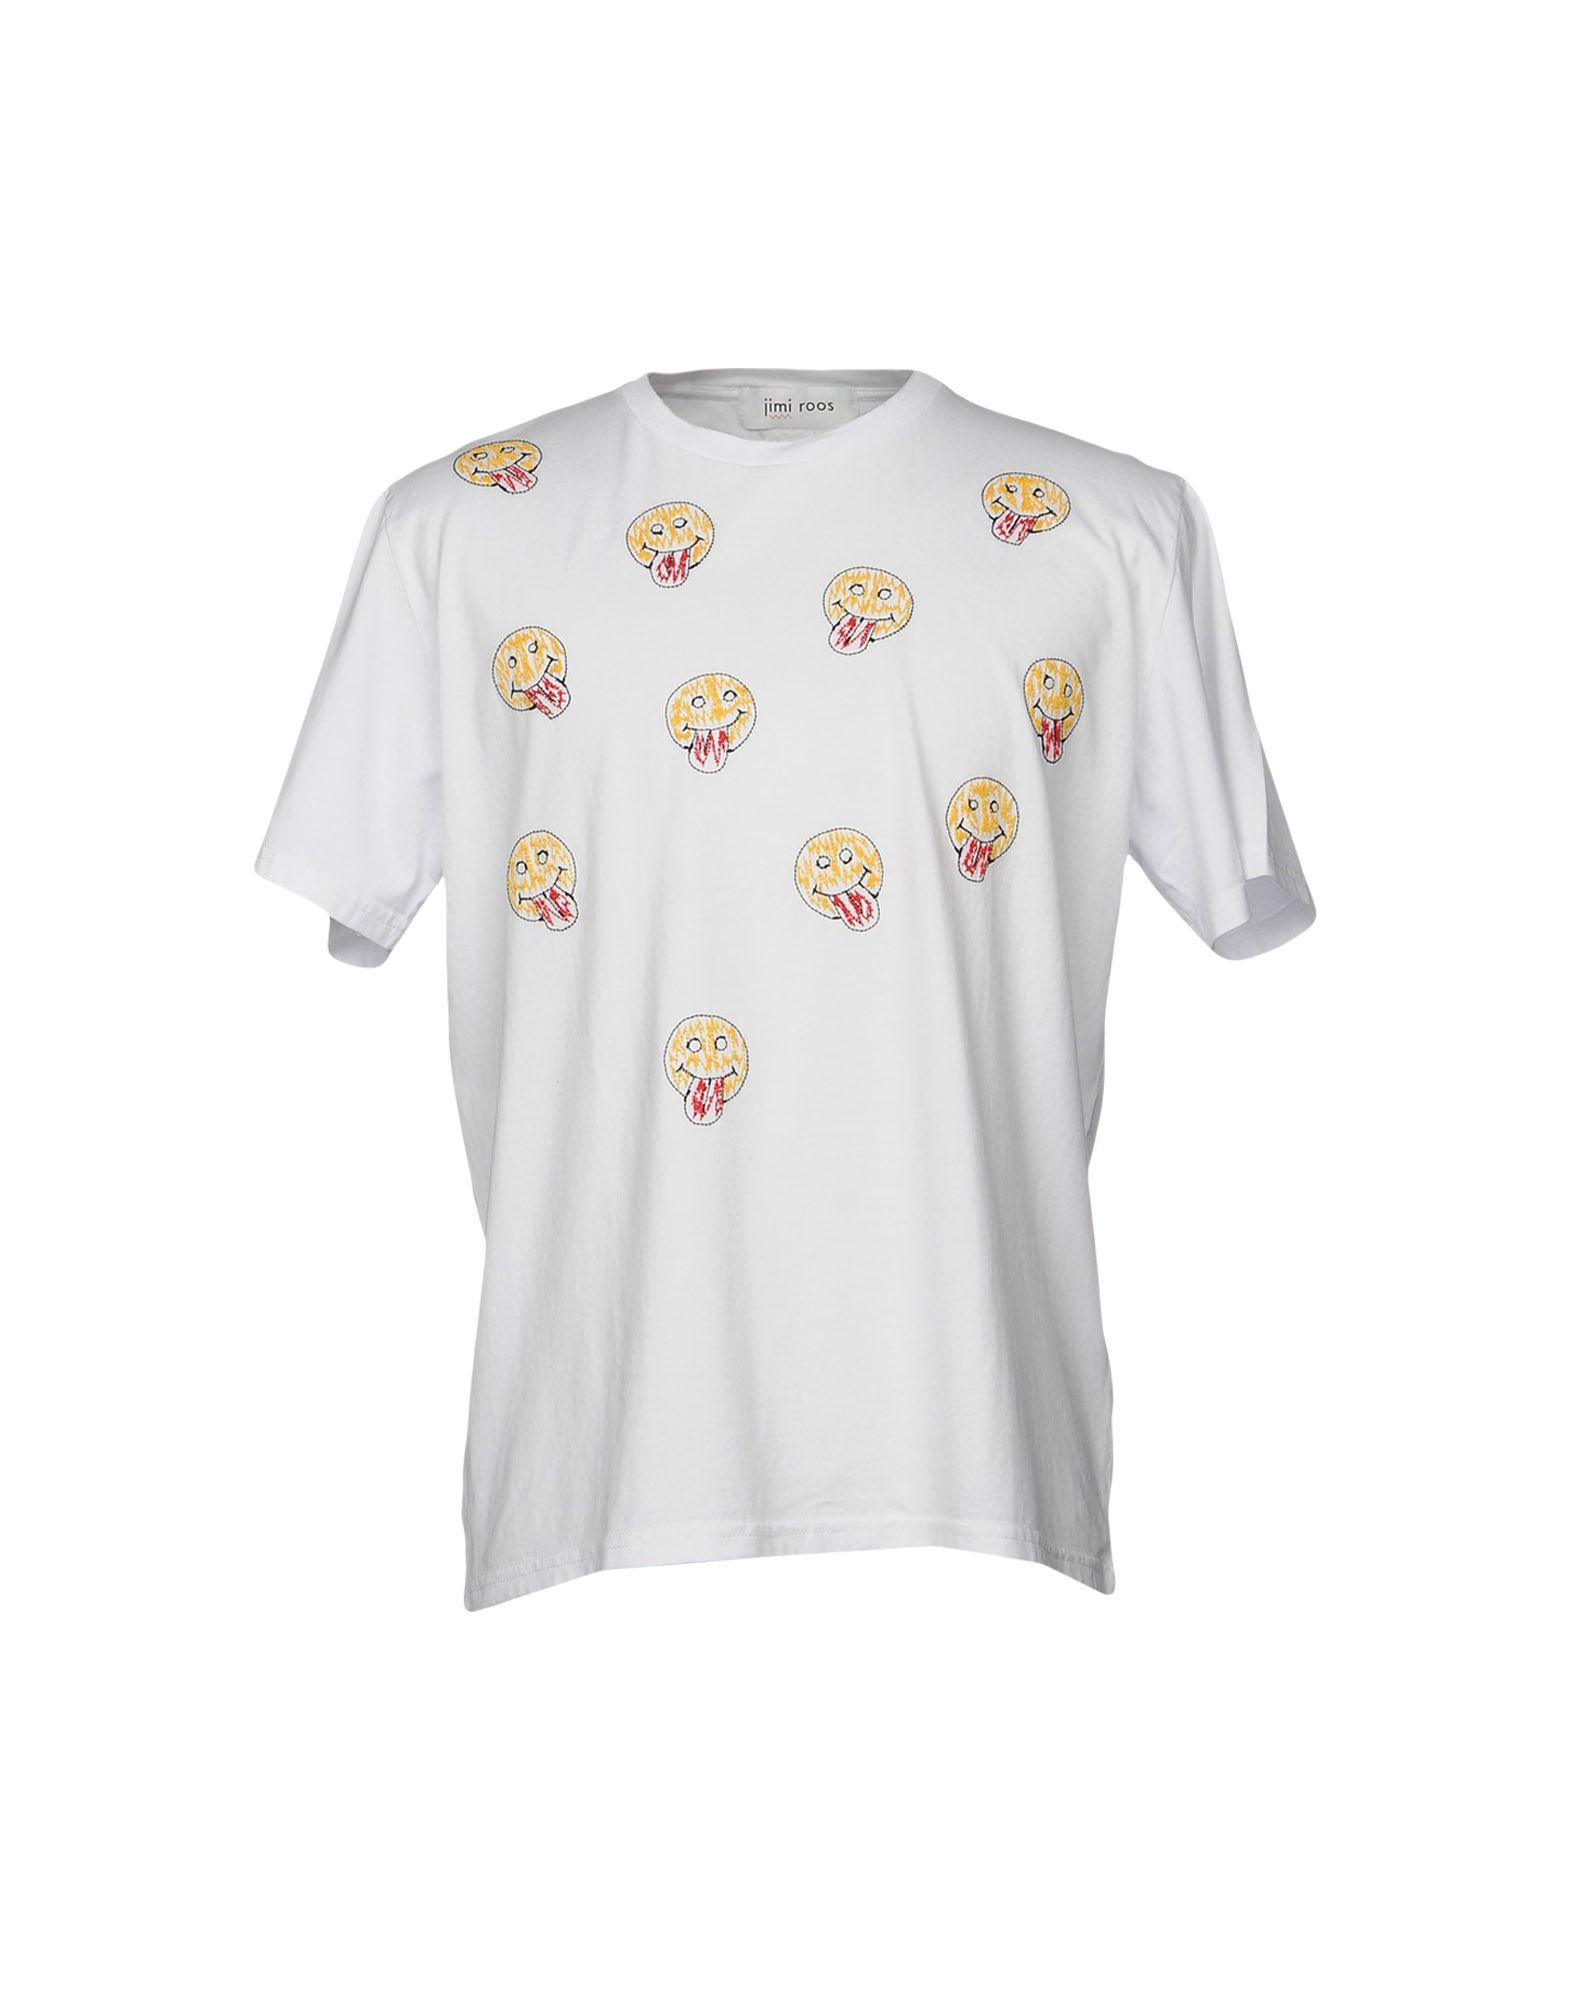 T-Shirt Jimi Roos Uomo - 12104977MA 12104977MA - dc4106